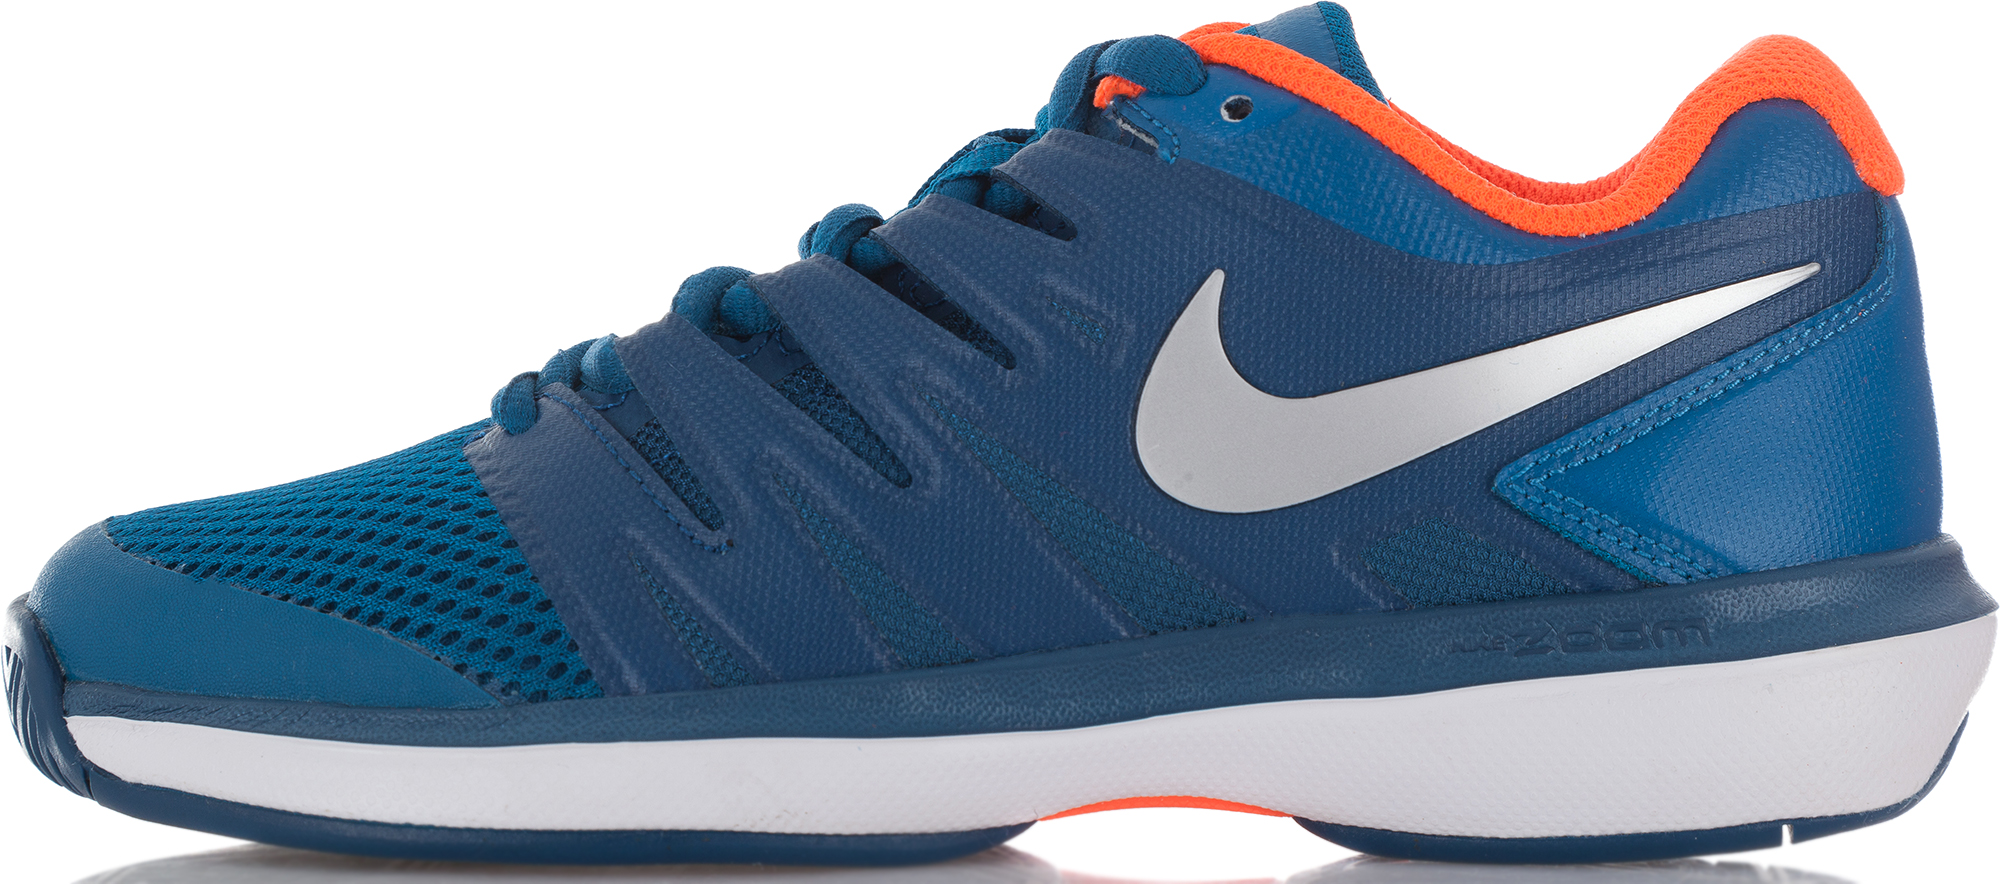 Nike Кроссовки для мальчиков Nike Air Zoom Prestige Hc, размер 37,5 nike кроссовки для мальчиков nike city court 7 размер 31